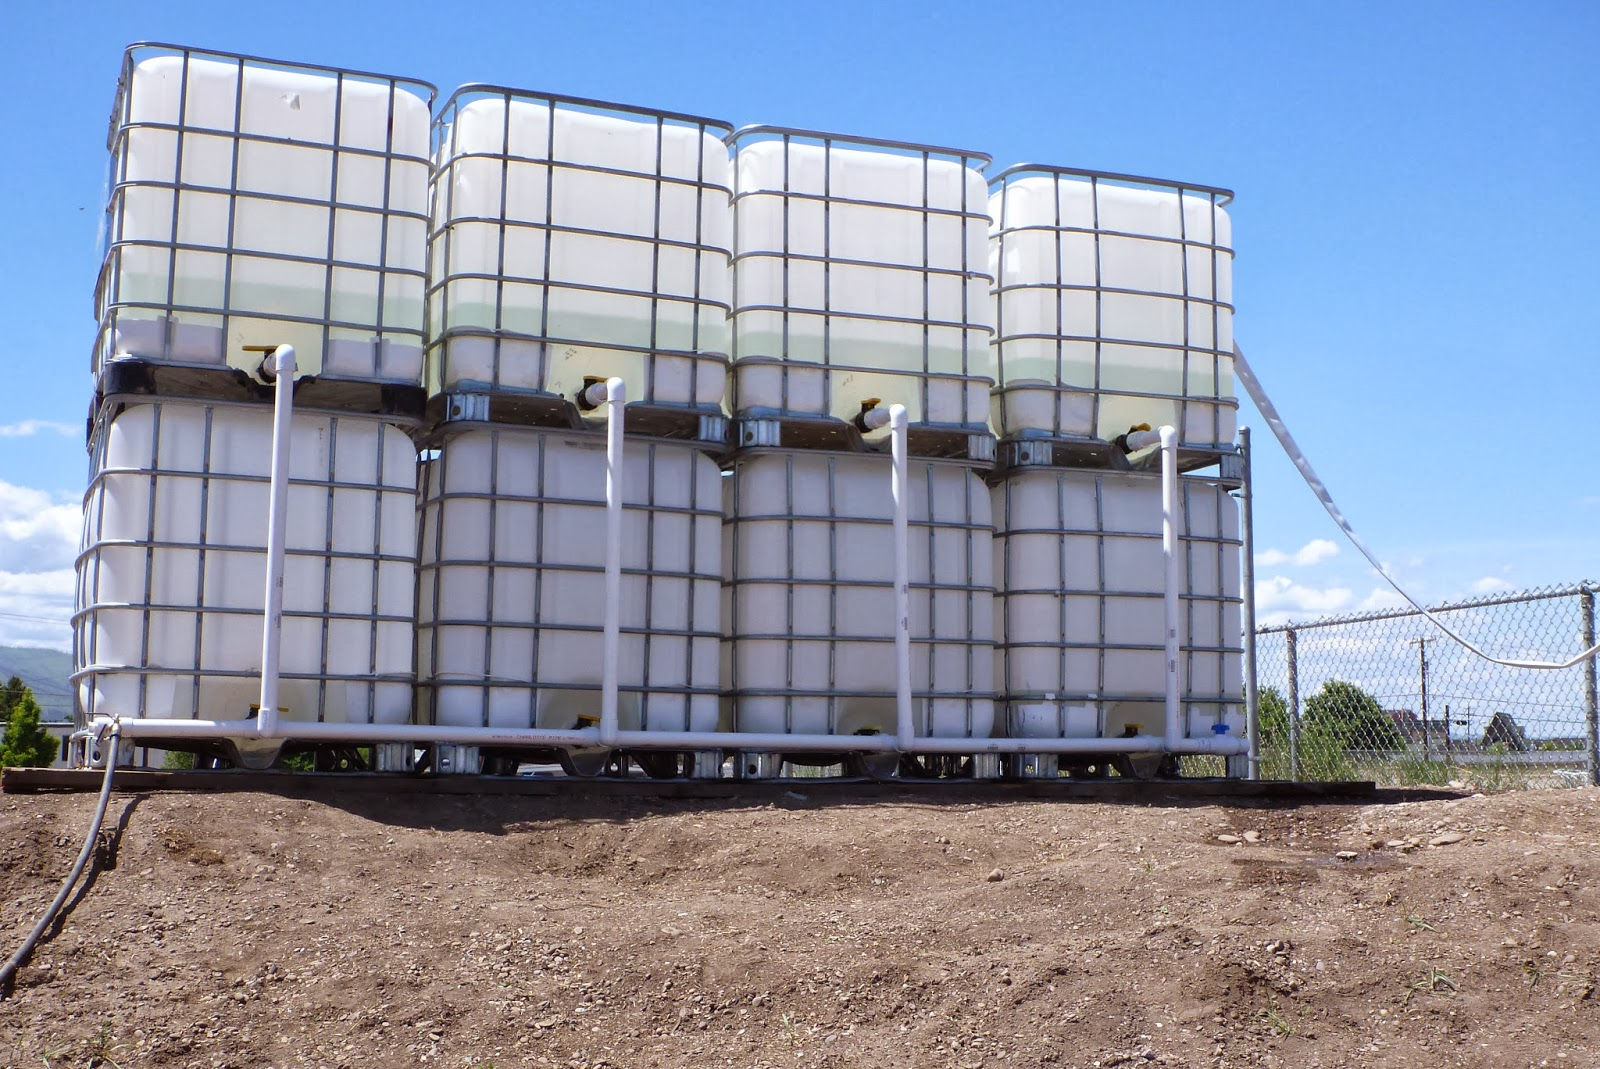 Water Tank Irrigation System : Freedom gardens gravity fed drip irrigation